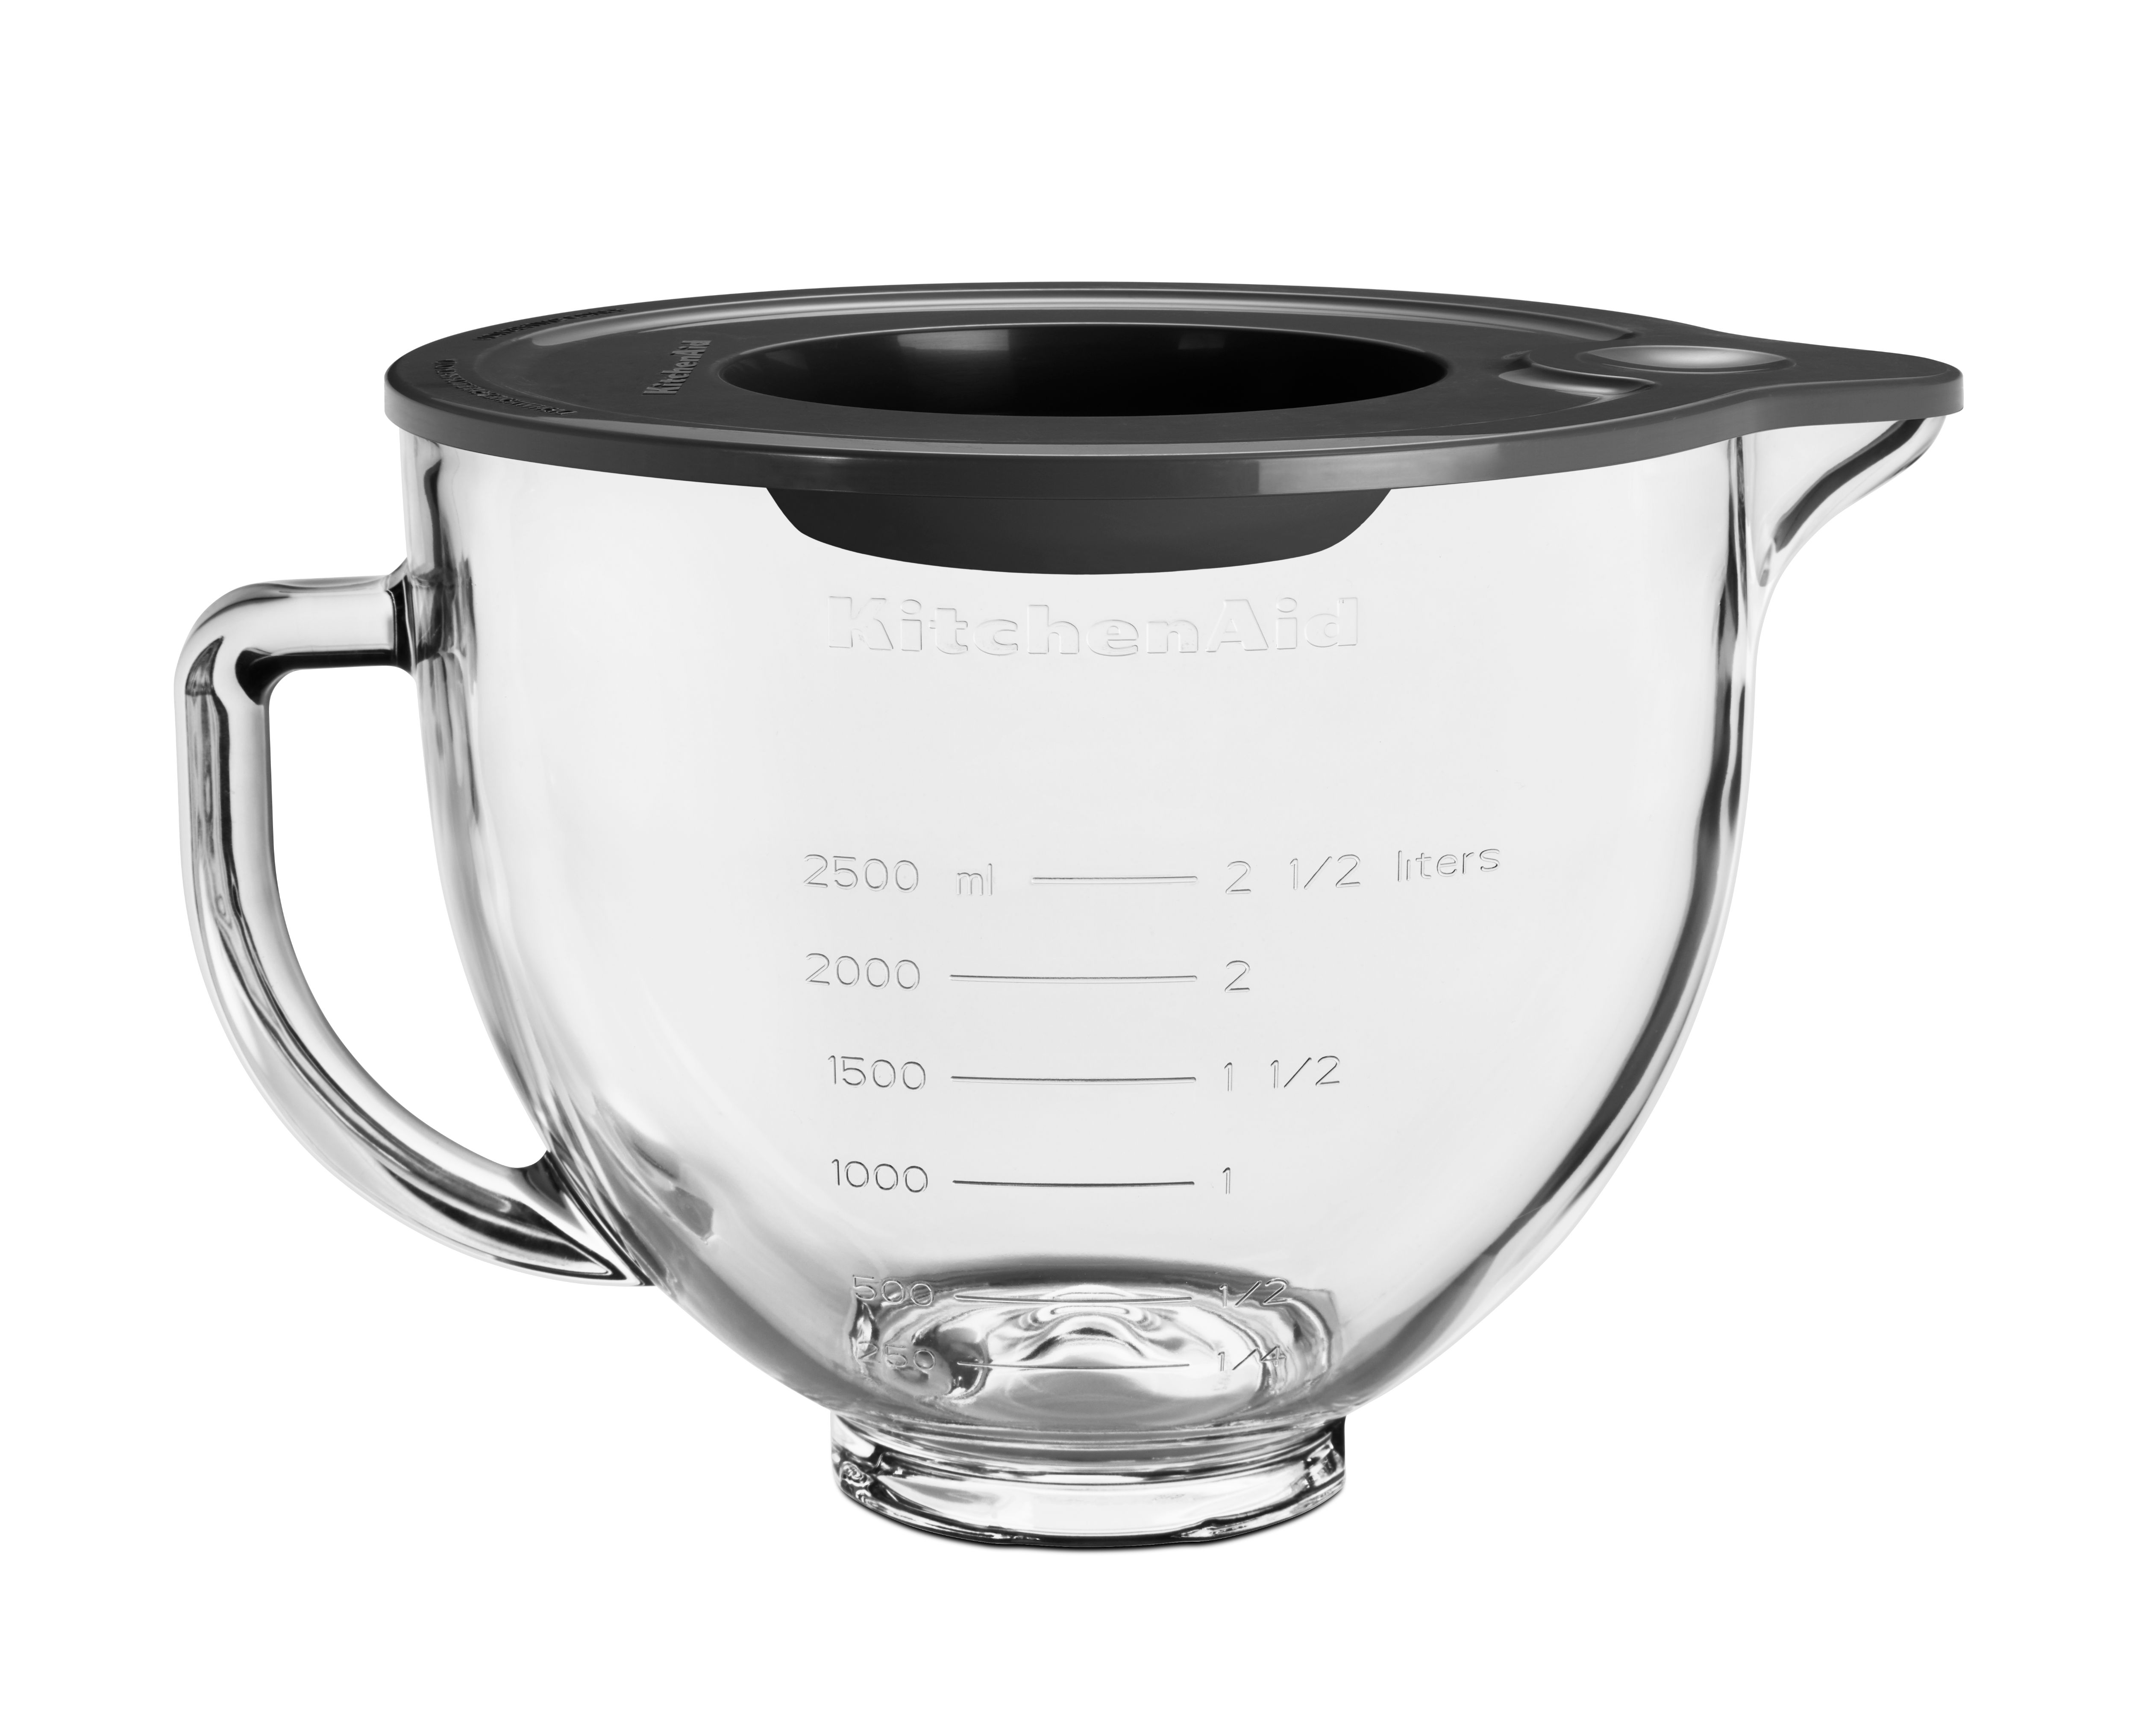 KitchenAid Artisan standmixer tilbehør, glasskål 4,7 liter